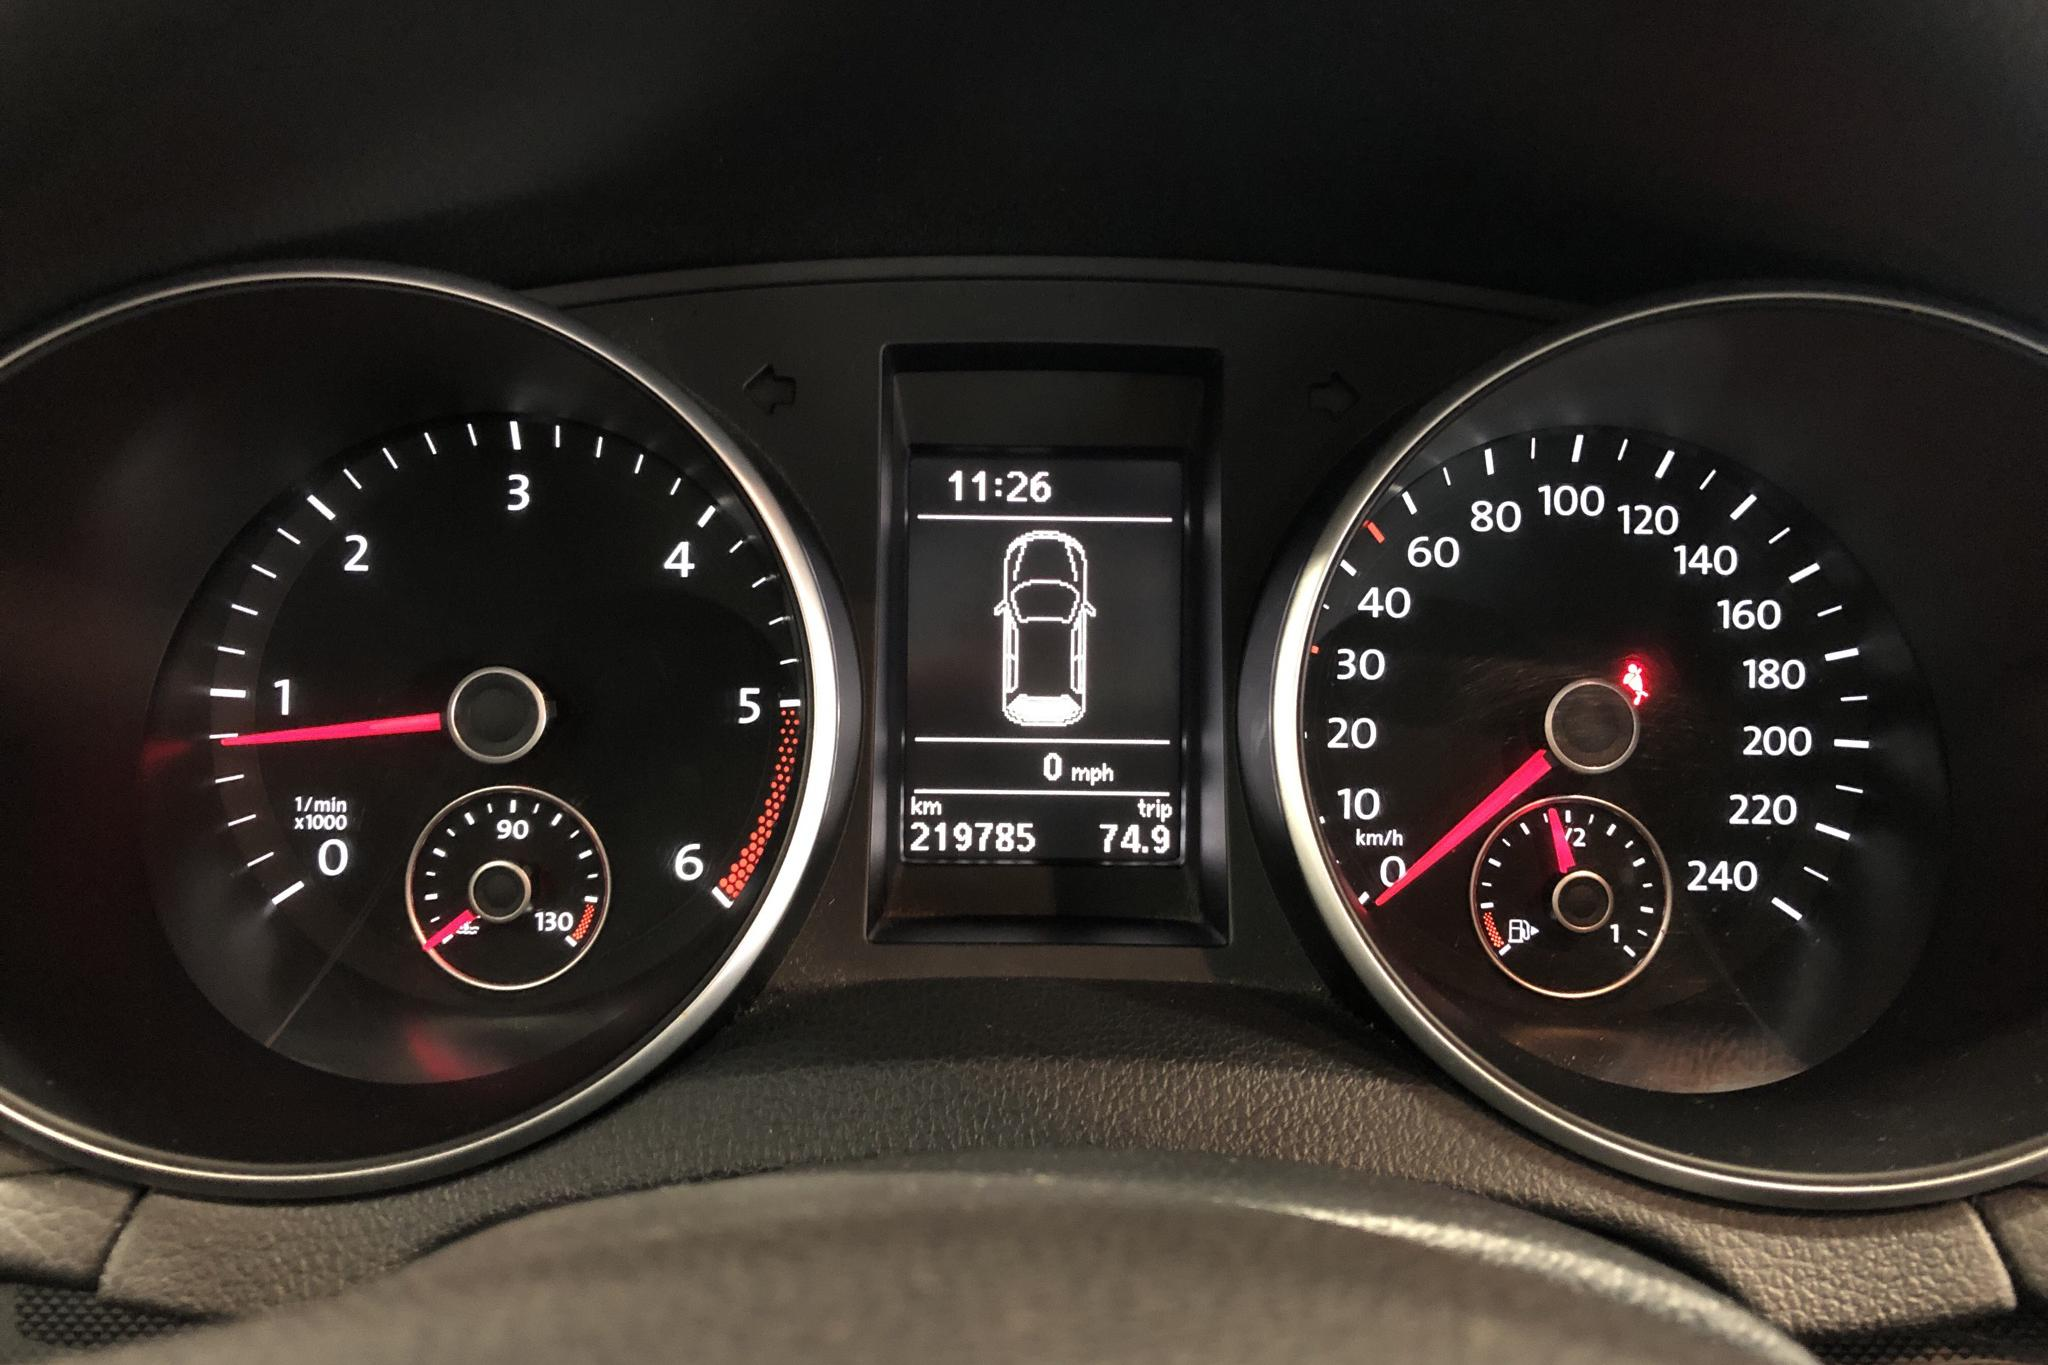 VW Golf VI 1.6 TDI Variant 4motion (105hk) - 0 km - Manual - Dark Grey - 2013